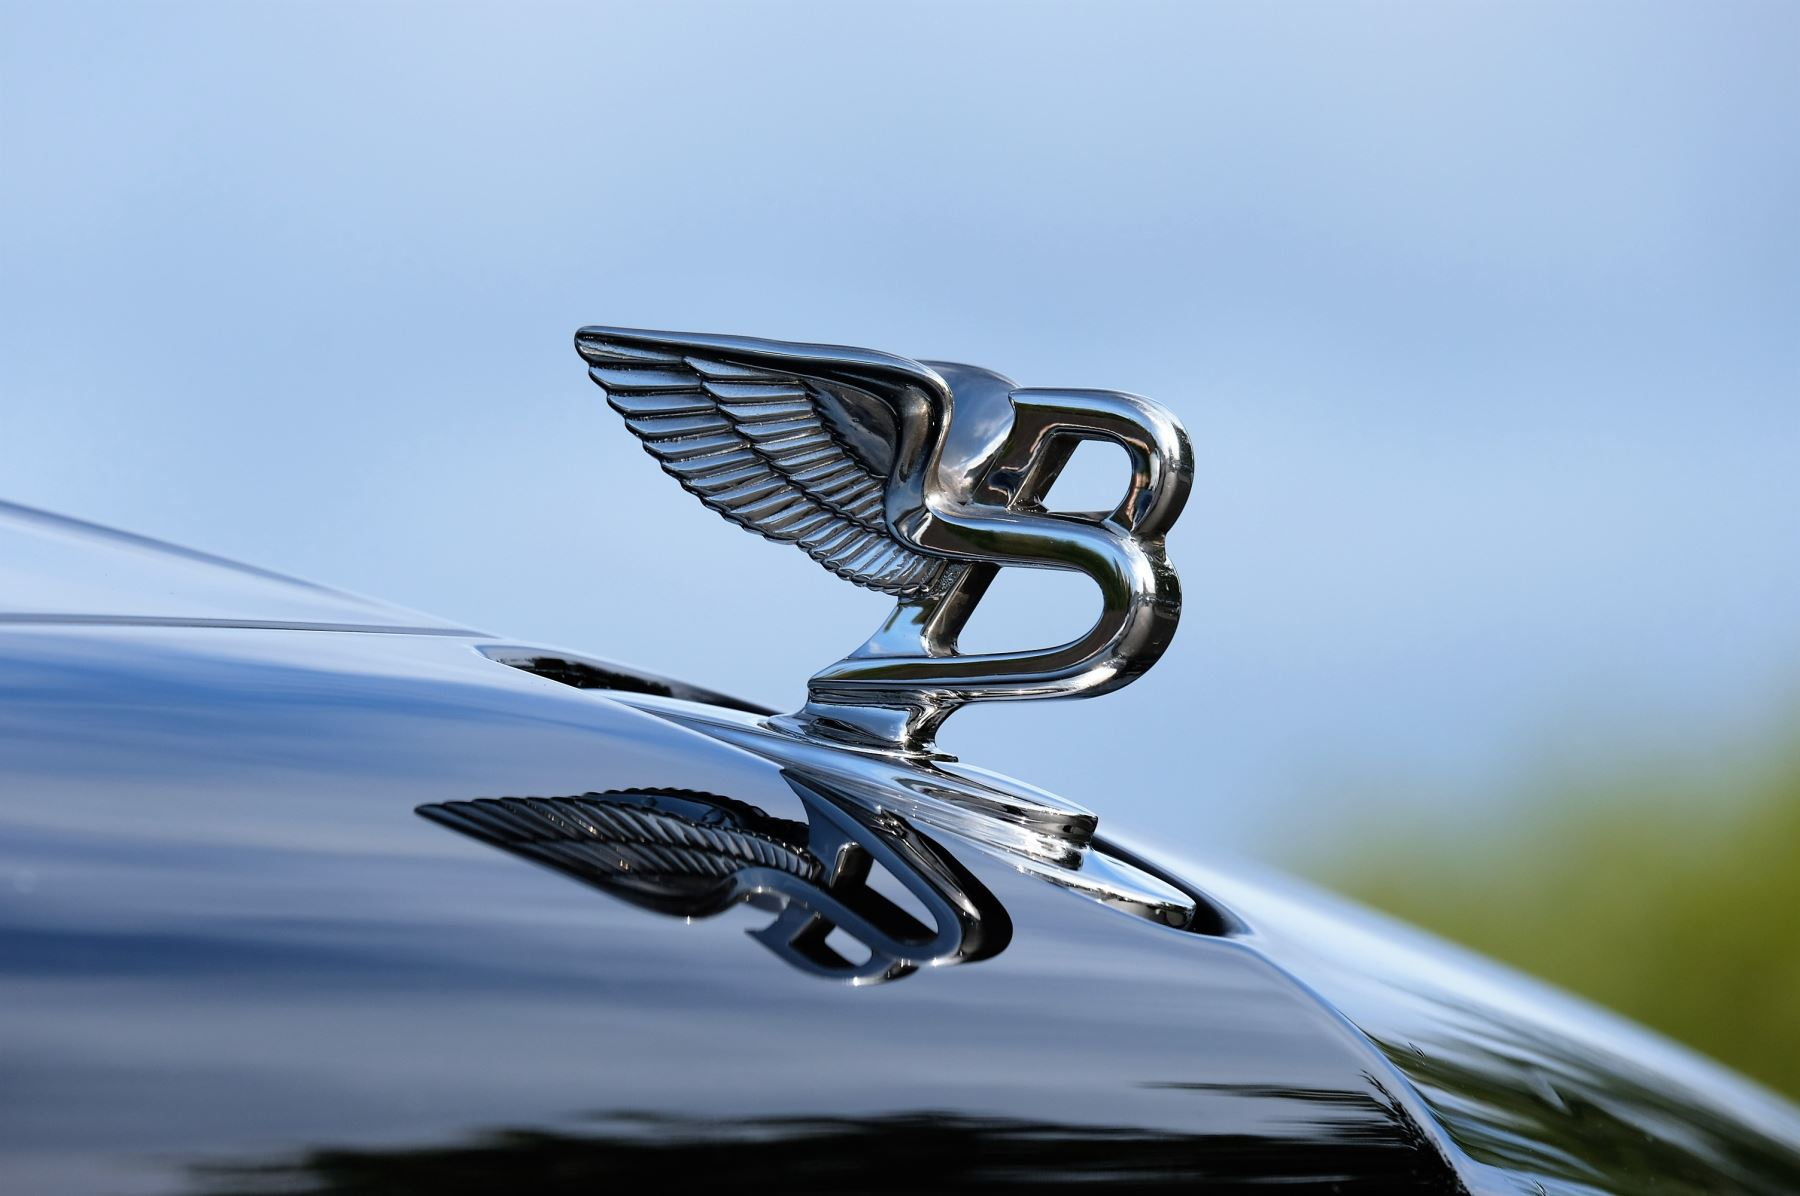 Bentley Mulsanne 6.8 V8 Speed image 8